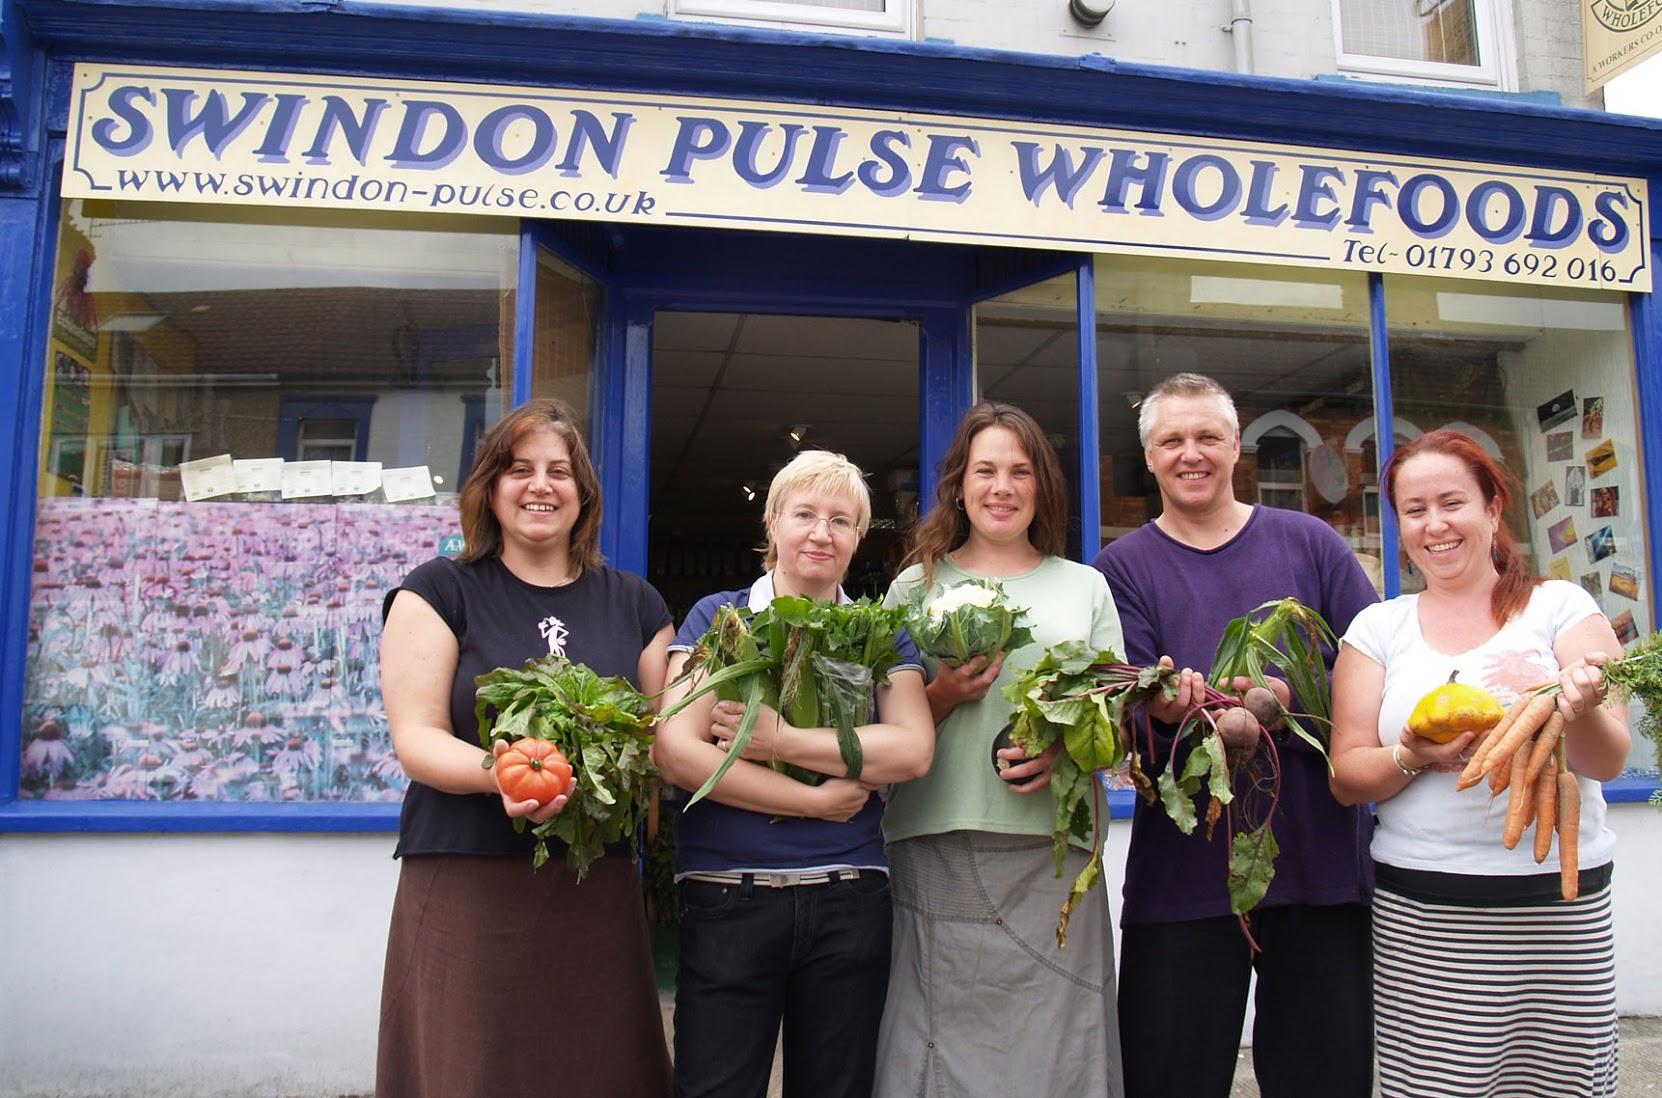 Swindon Pulse